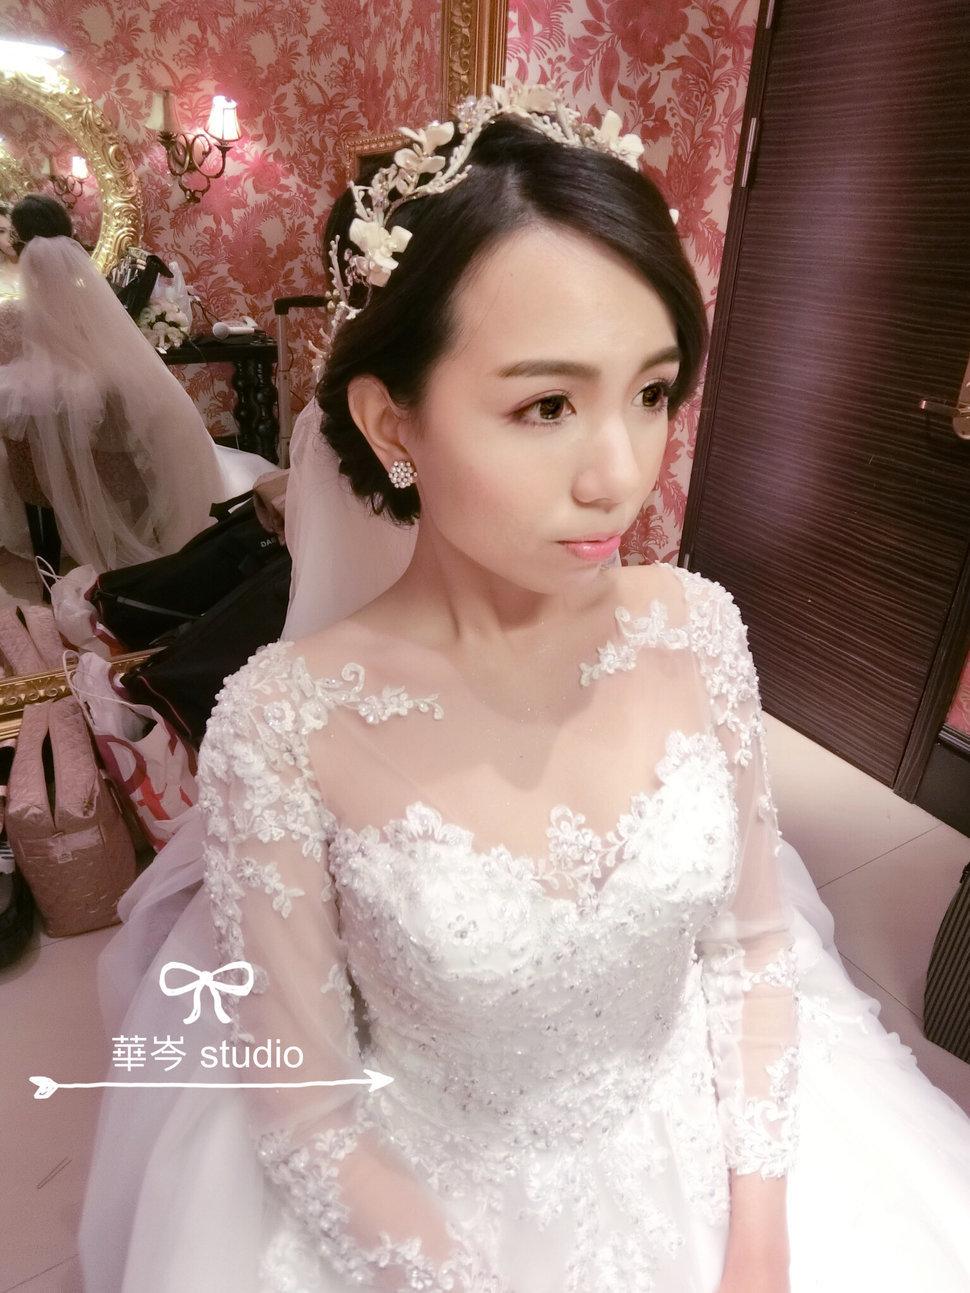 IMG_0720 - 華岑Zoey MakeUp Stylis - 結婚吧